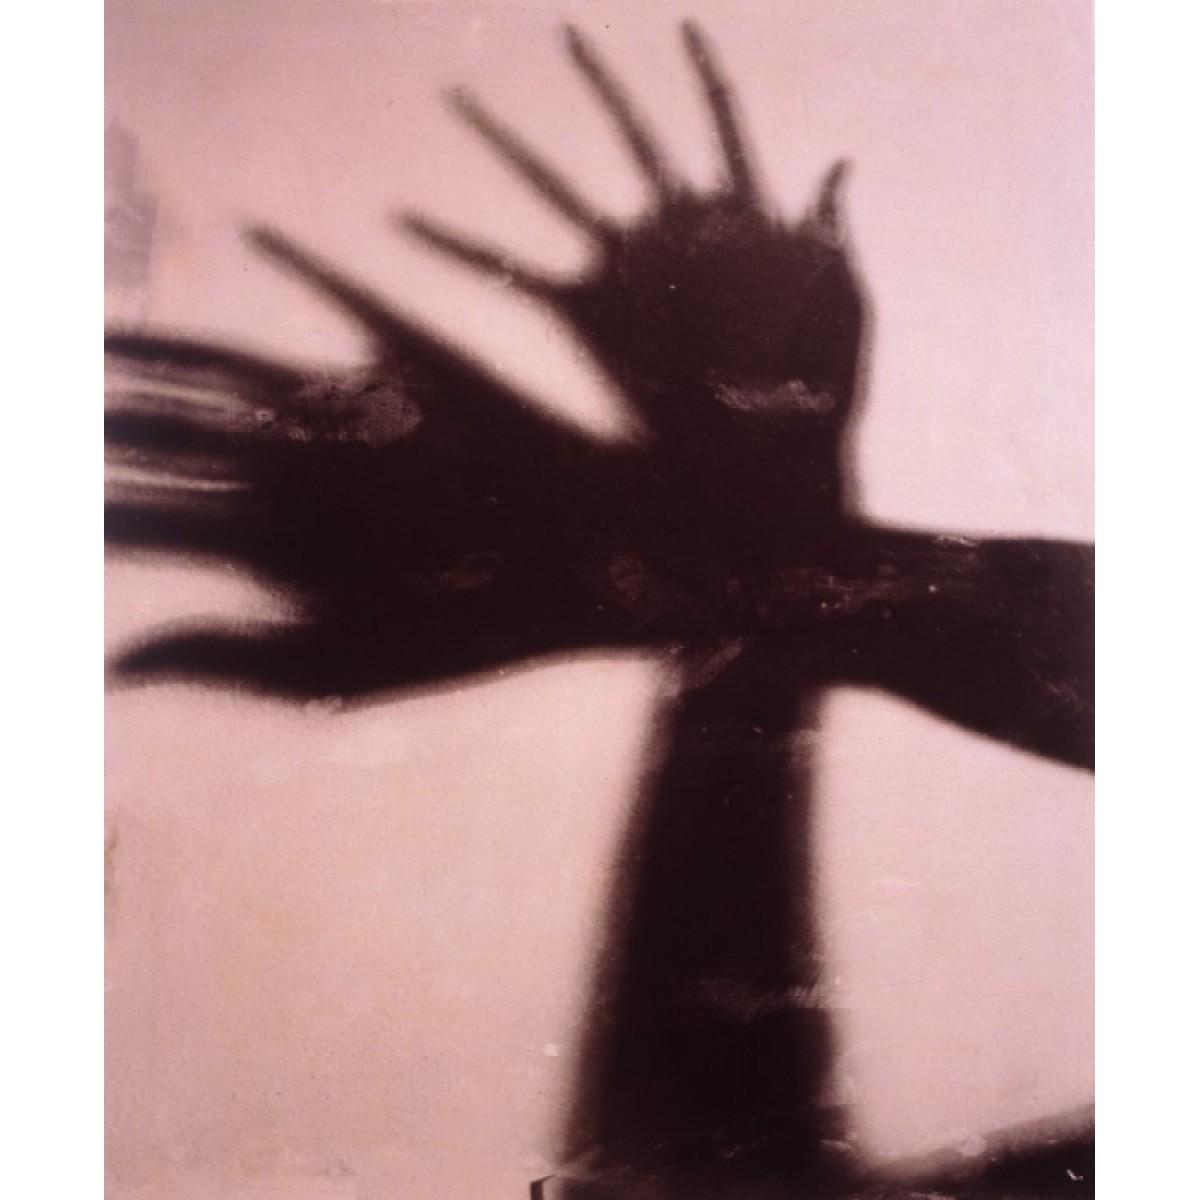 Untitled (Hand), 1997